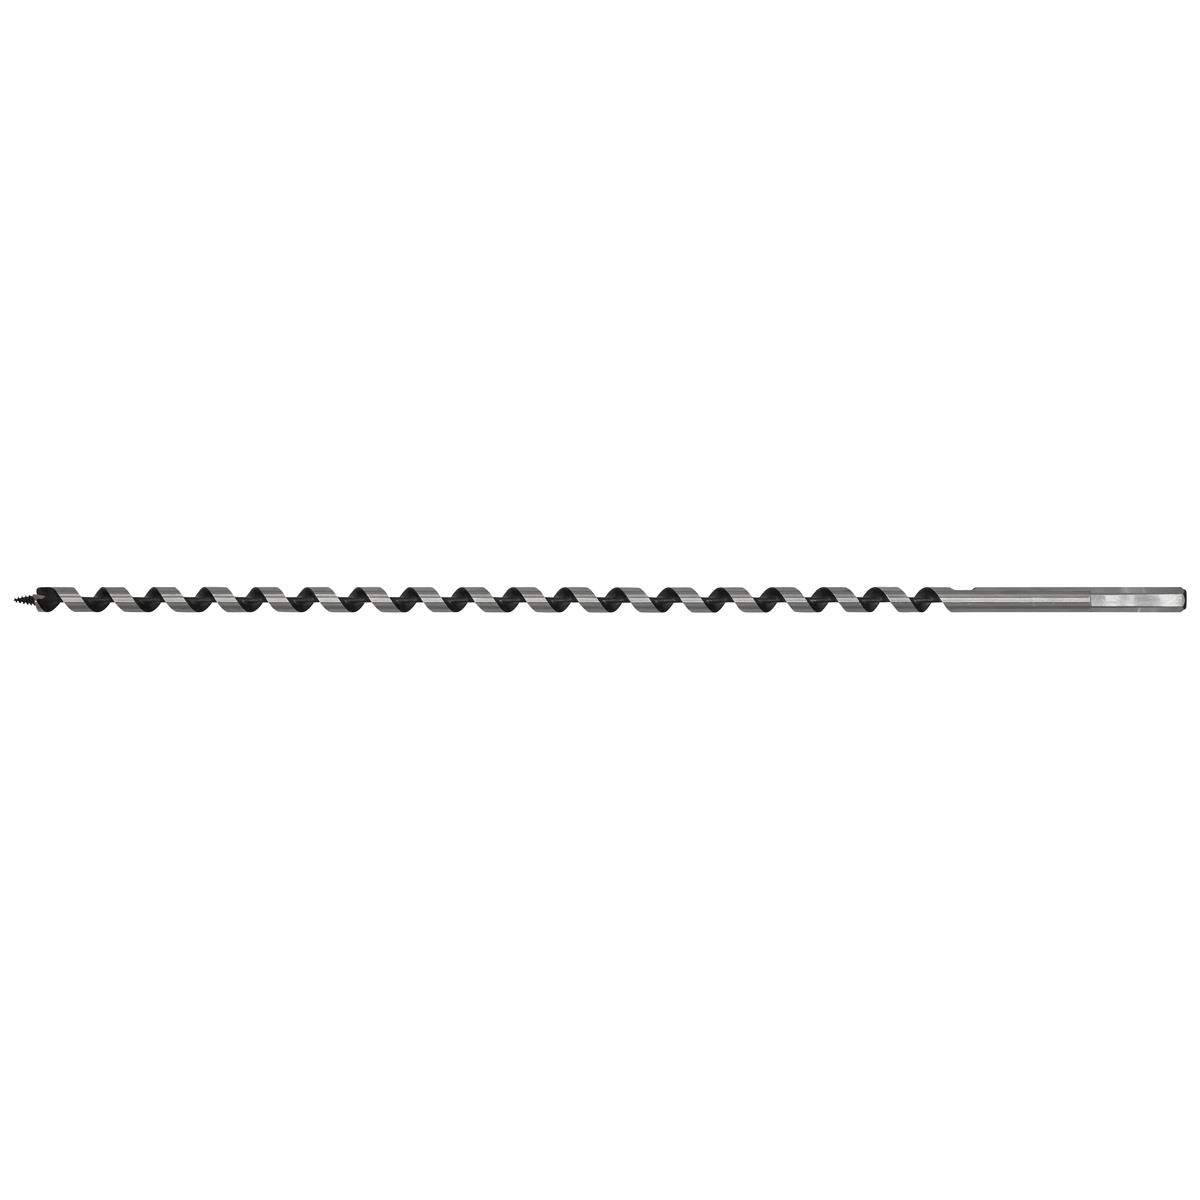 Auger Wood Drill Ø10 x 460mm